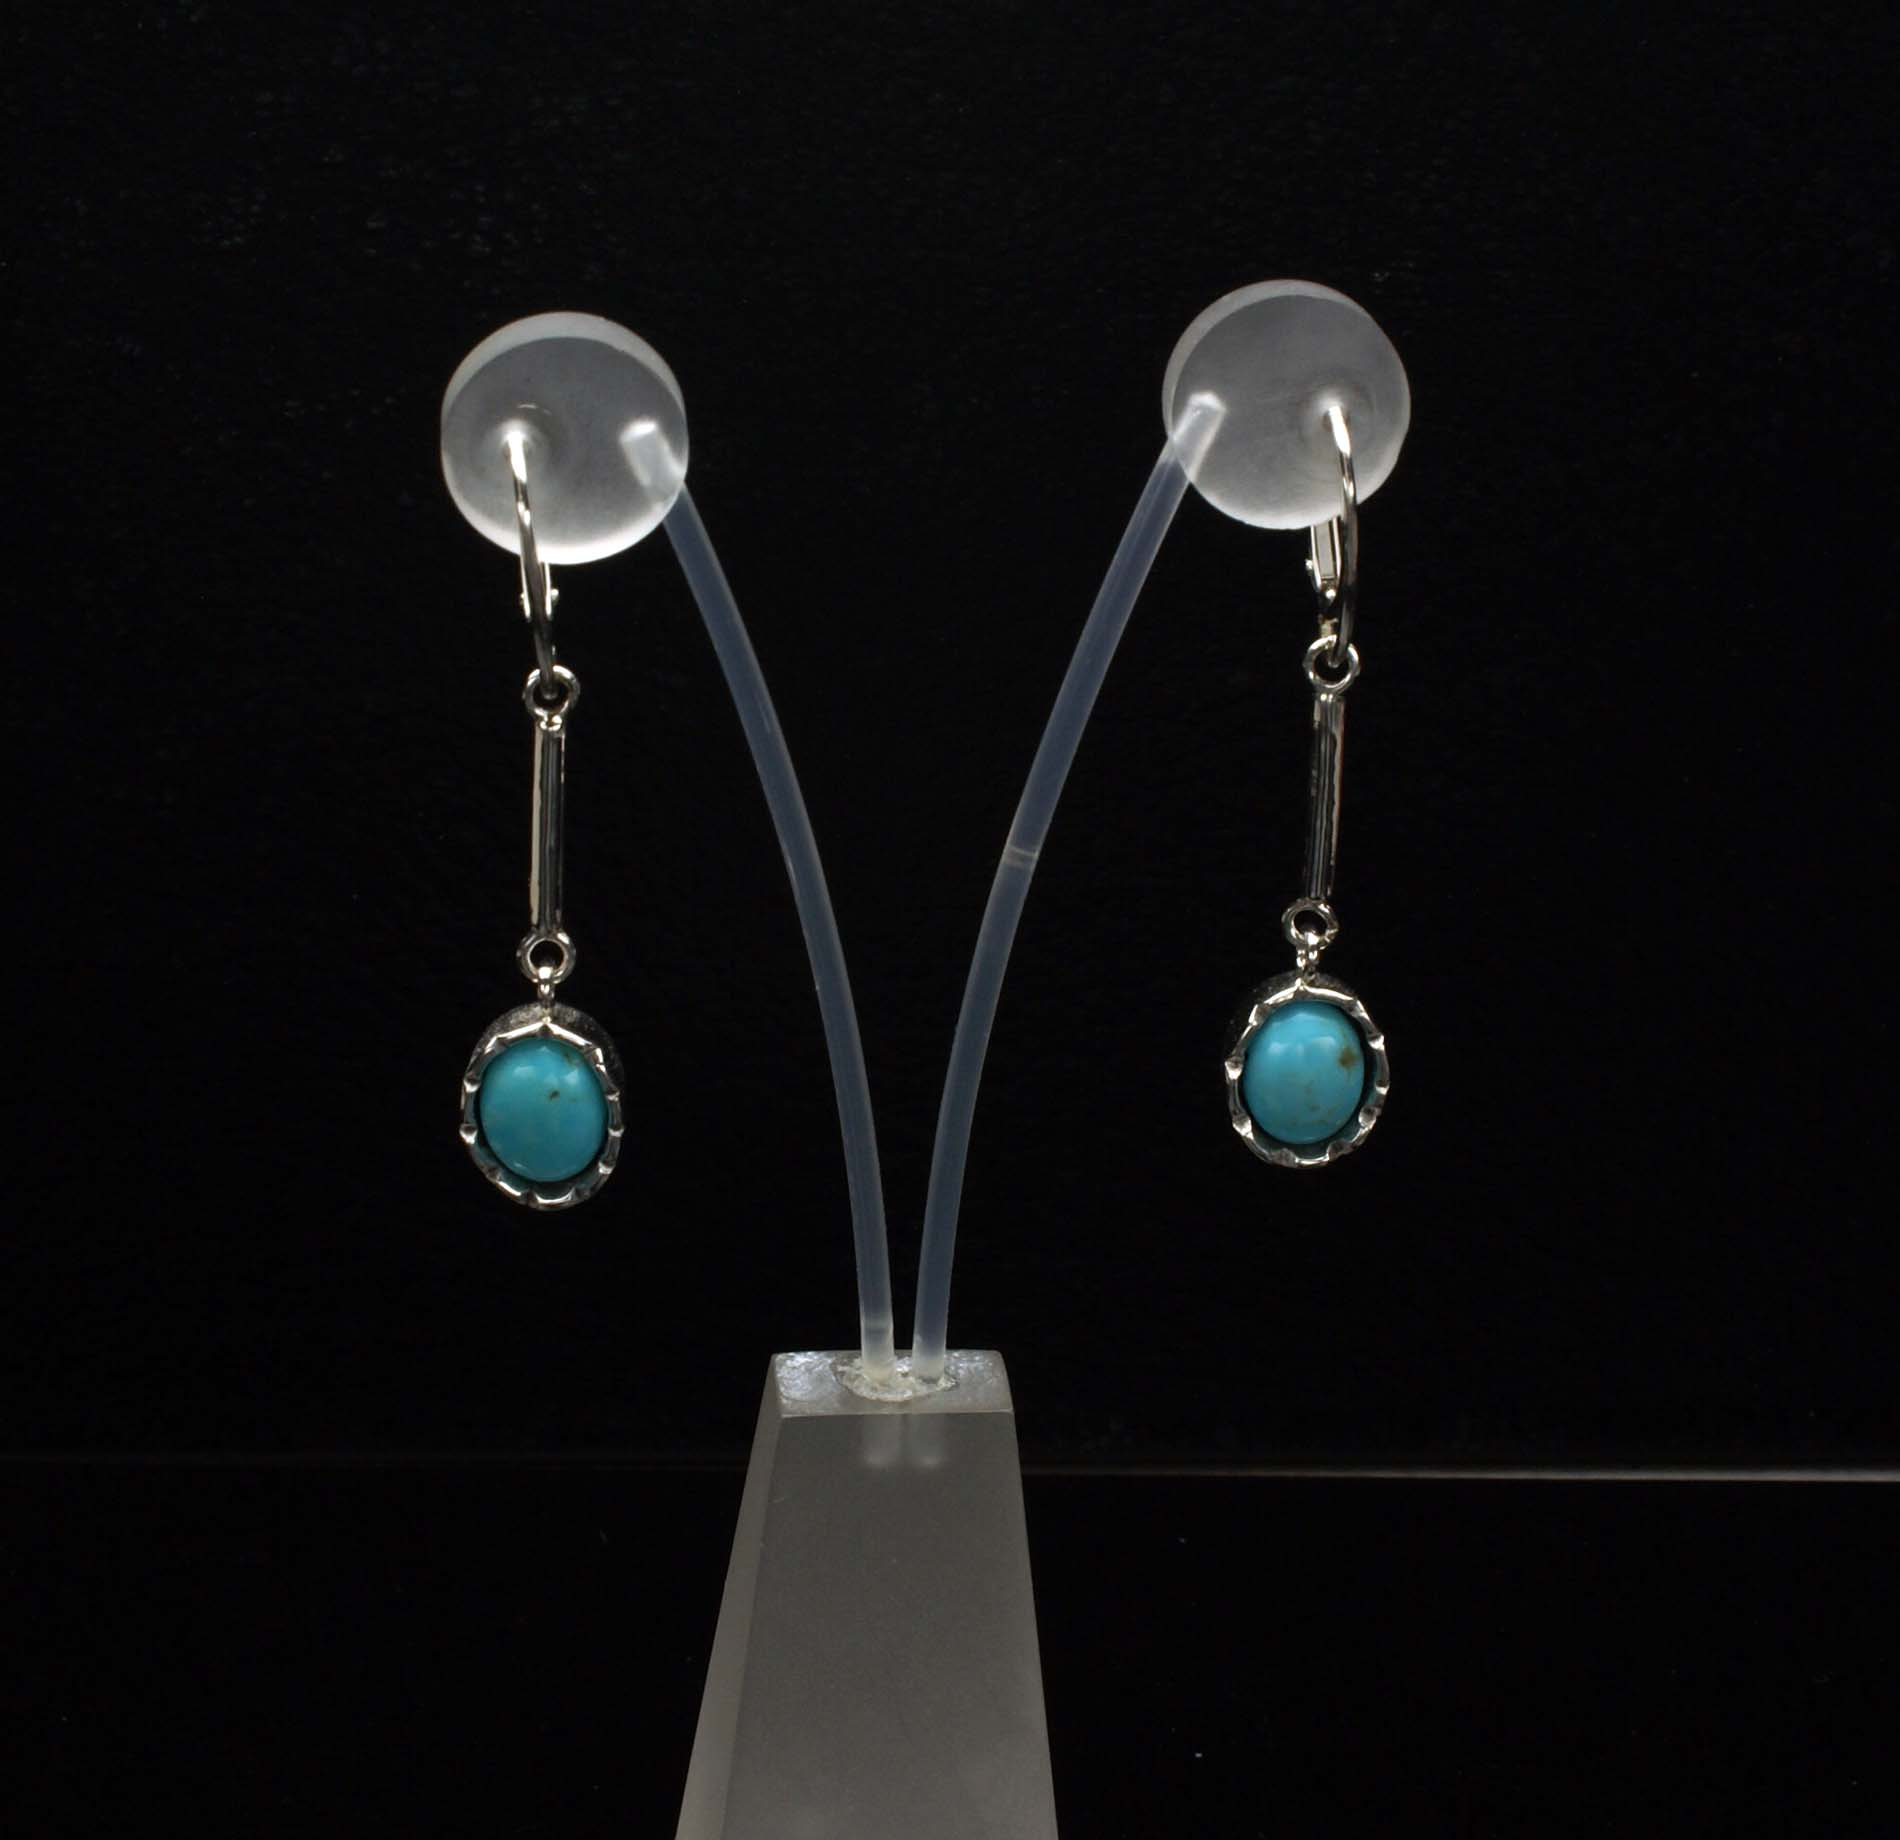 Turquoise Hanging Earrings